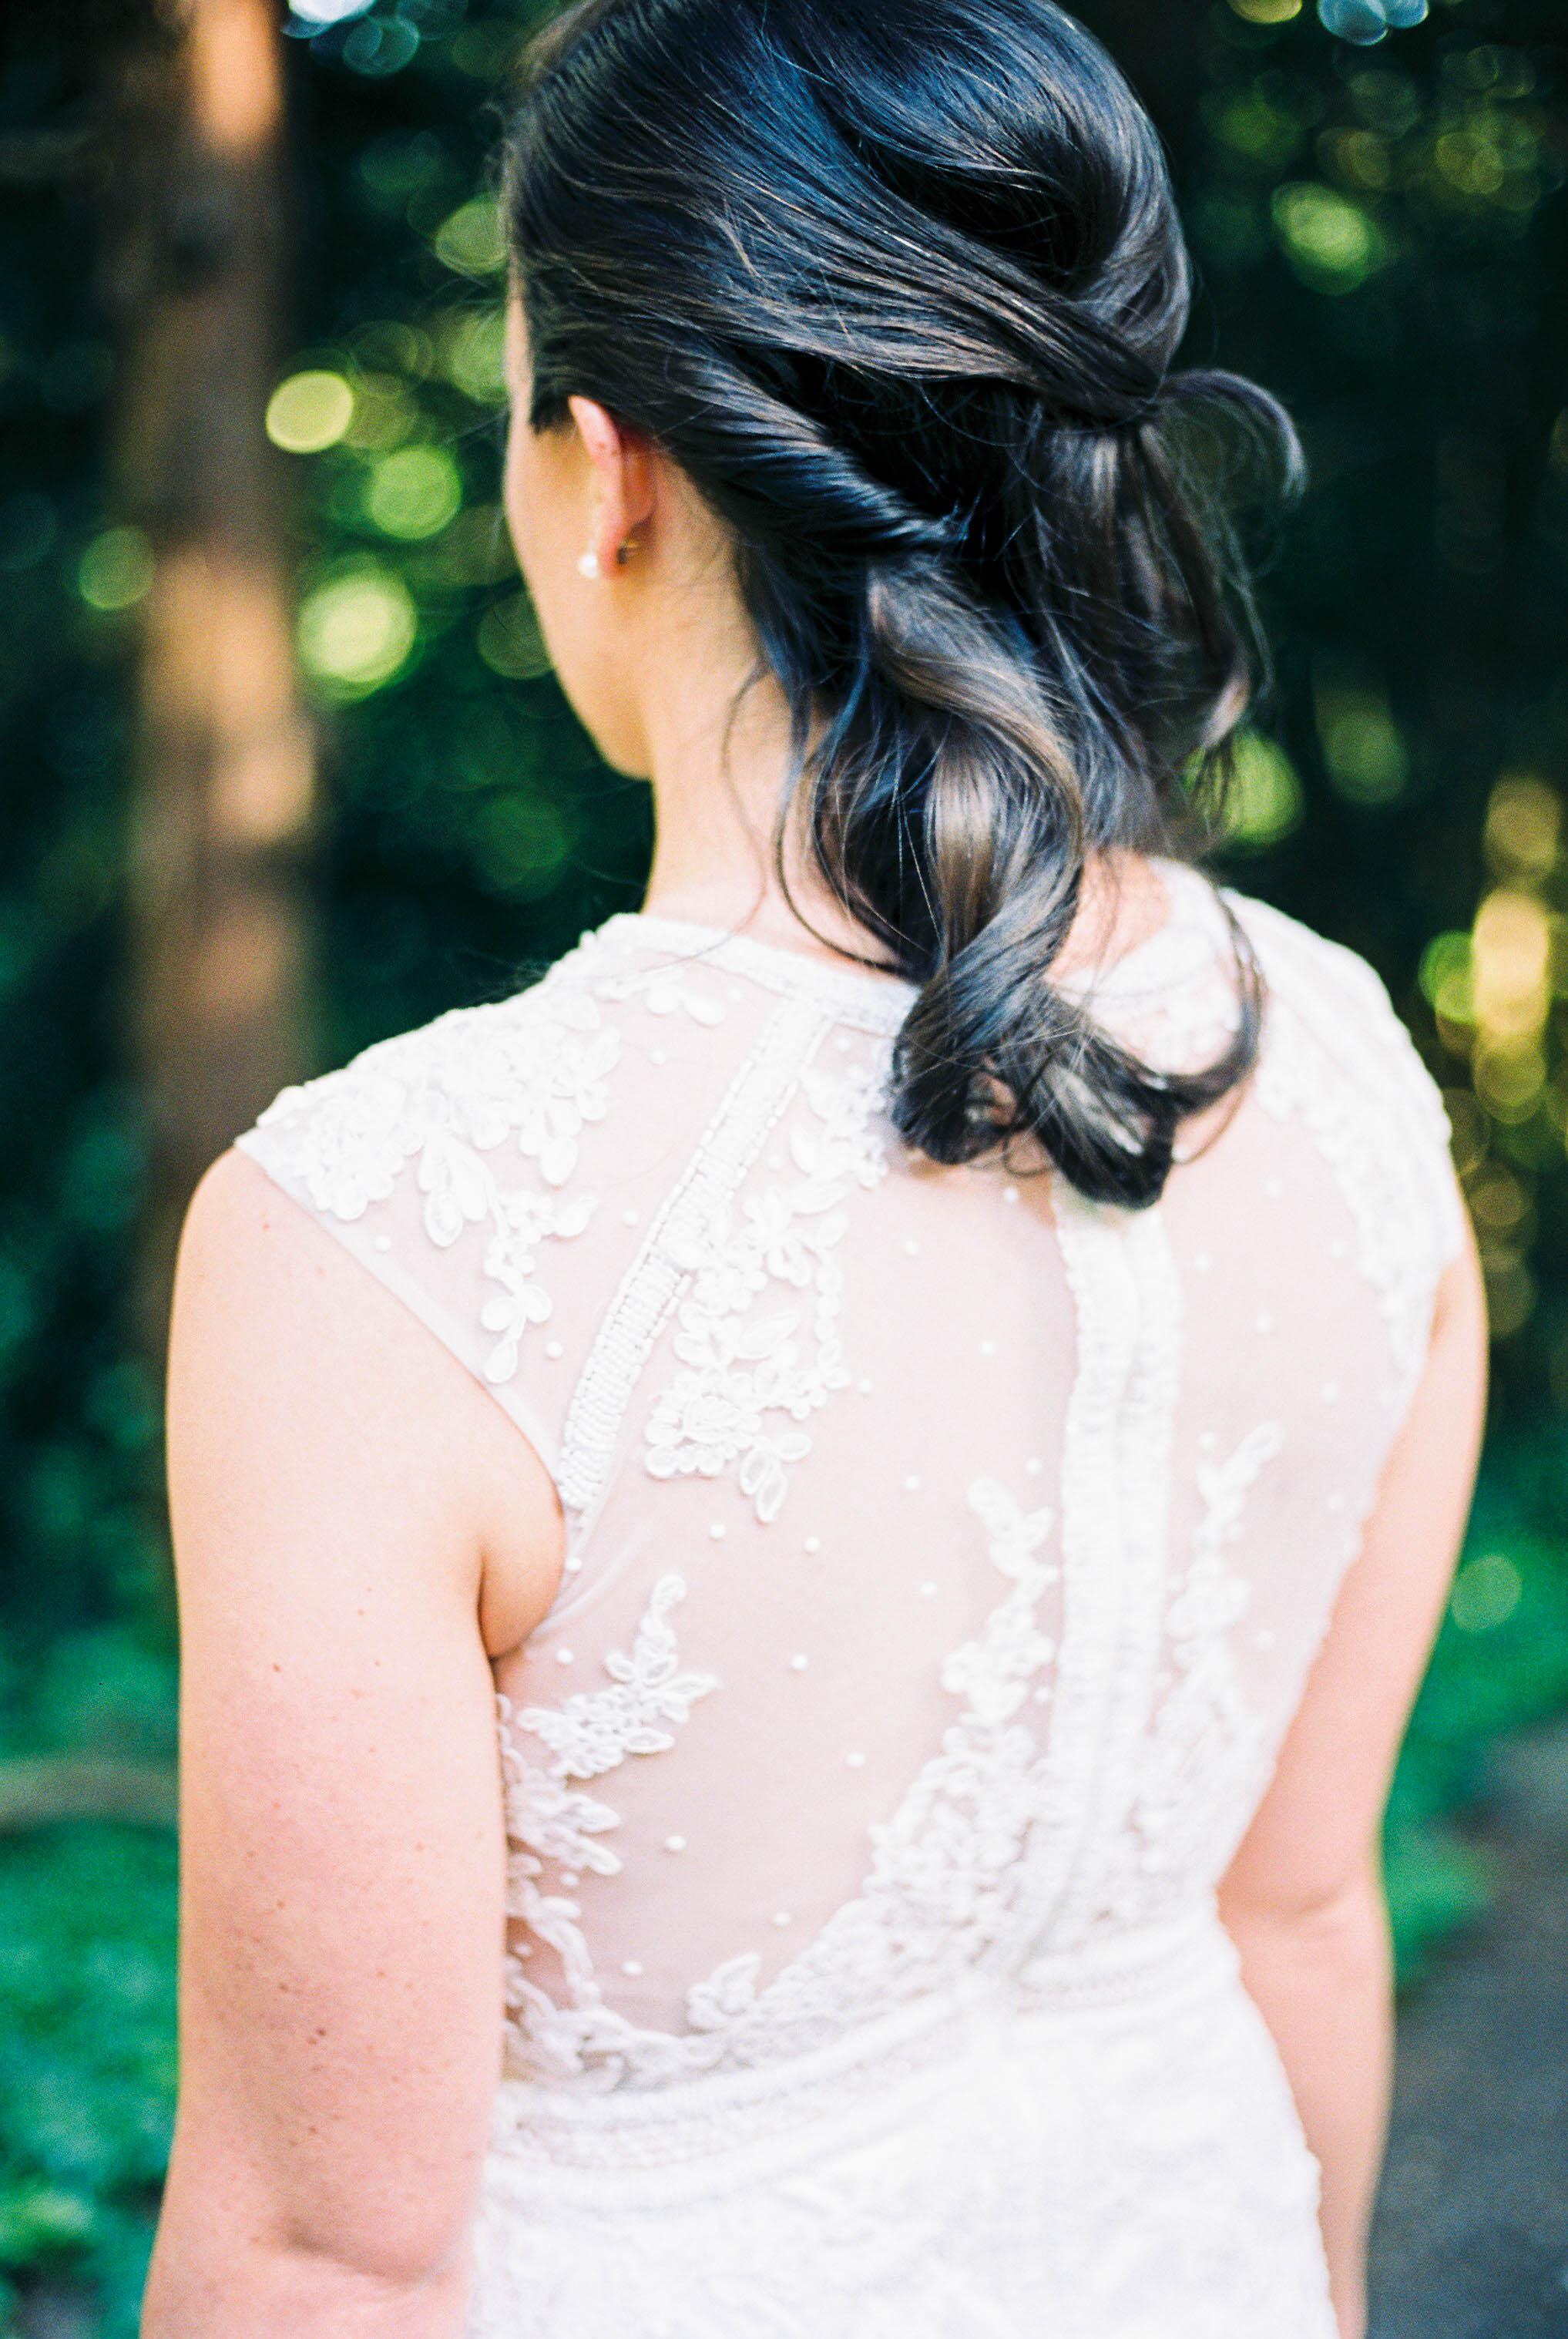 Wedding Planner Seattle   Wedding Wise   Kerry Jeanne Photography   JM Cellars Wedding   Wedding half up hairstyle